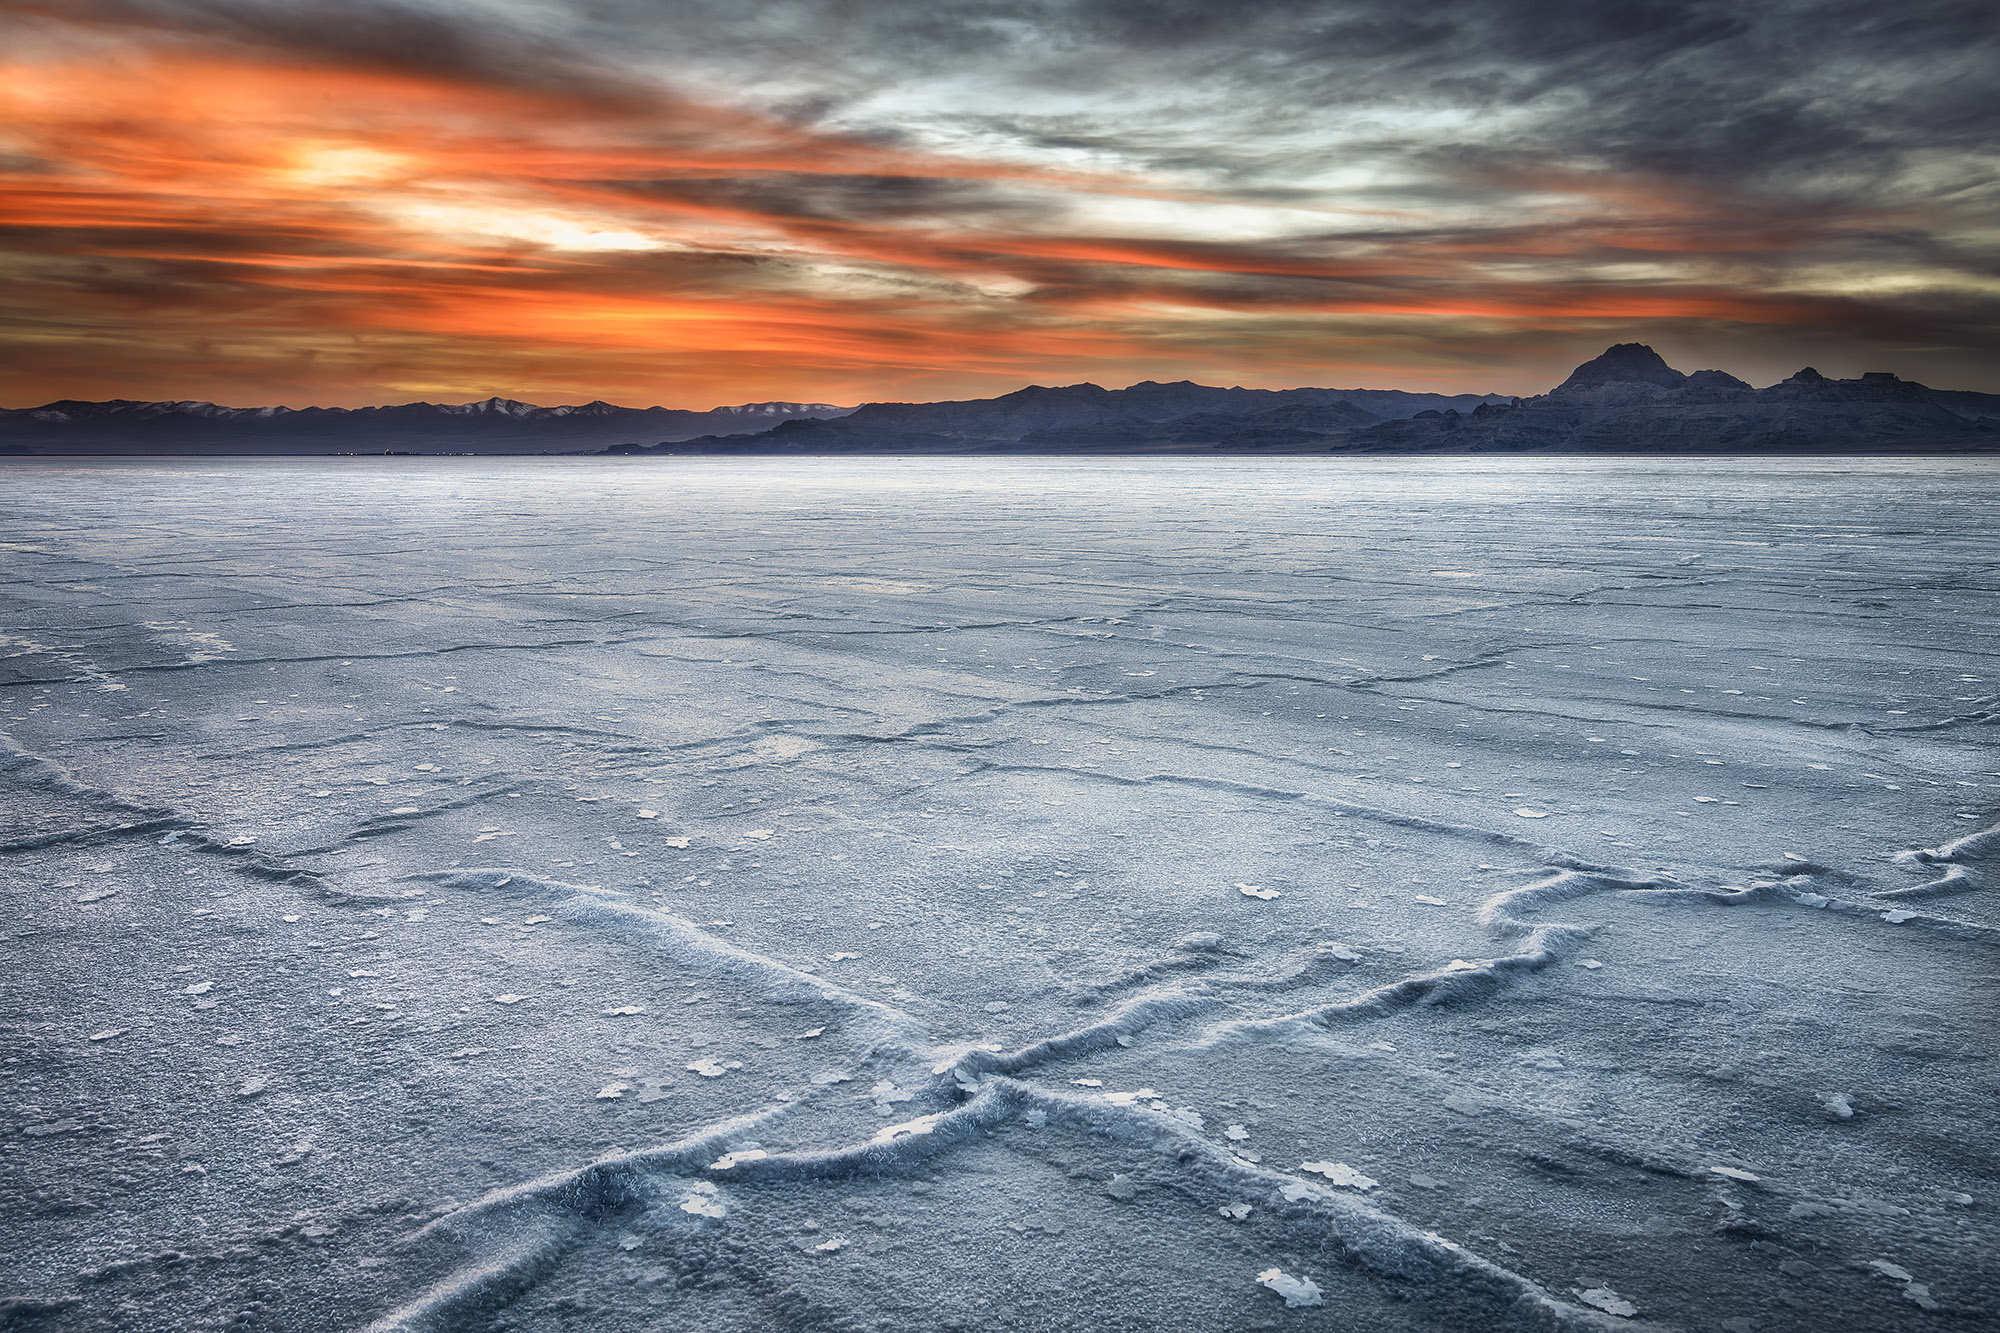 Early morning, salt flats